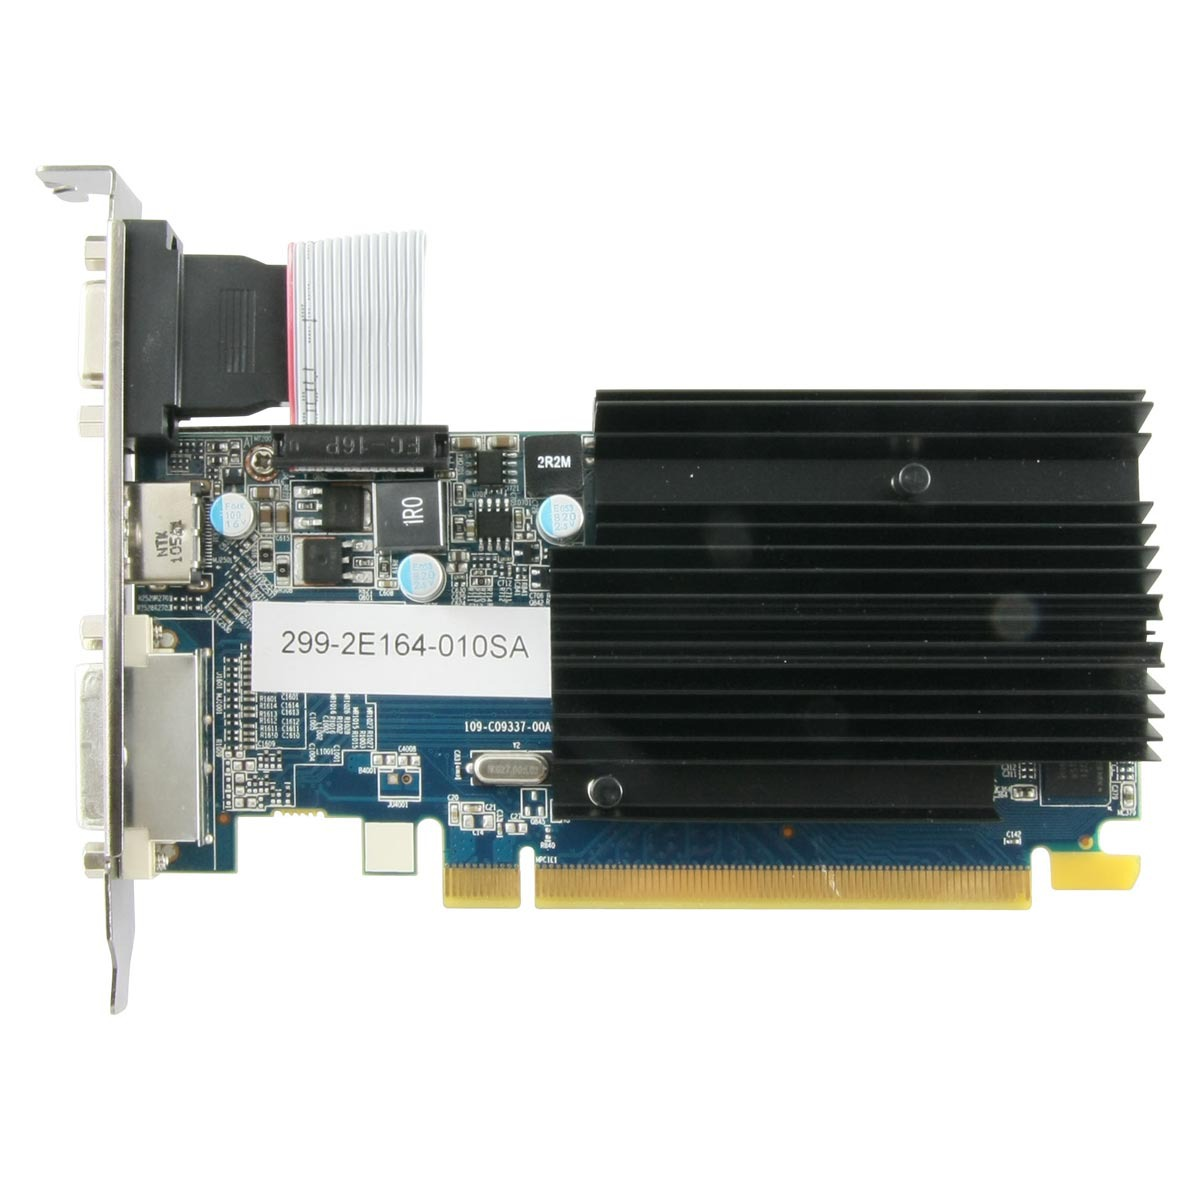 carte graphique amd radeon r2 Sapphire Radeon HD 6450 1 GB DDR3 (11190 02 20G)   Achat Carte